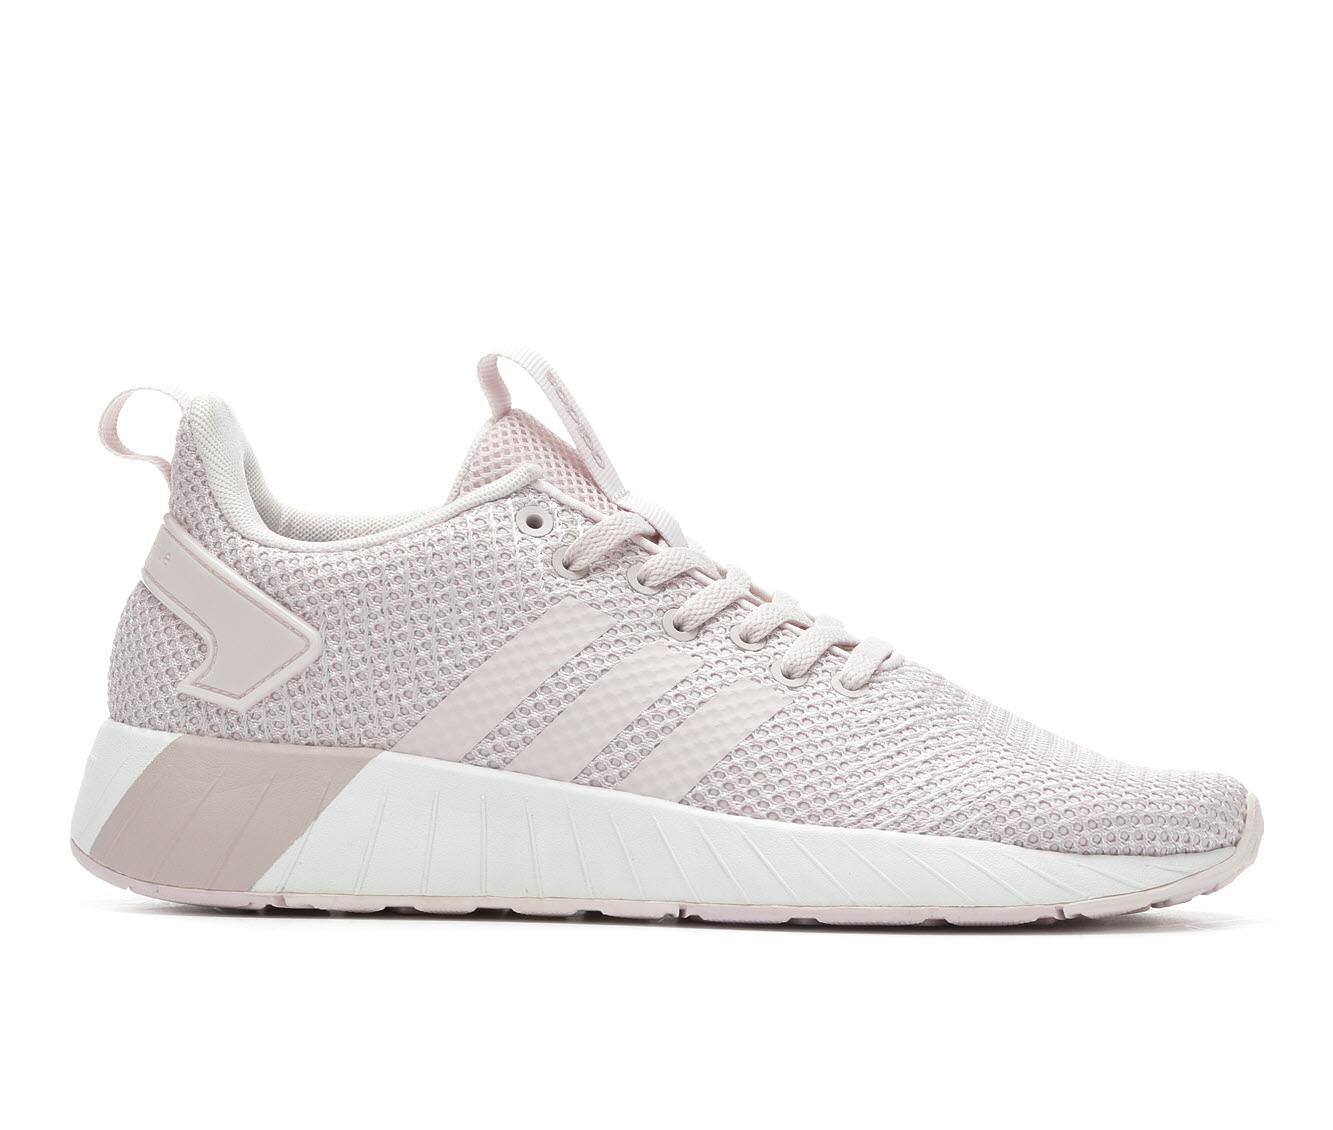 Adidas X 17.3 Ag S82361 Ugliest Jordans